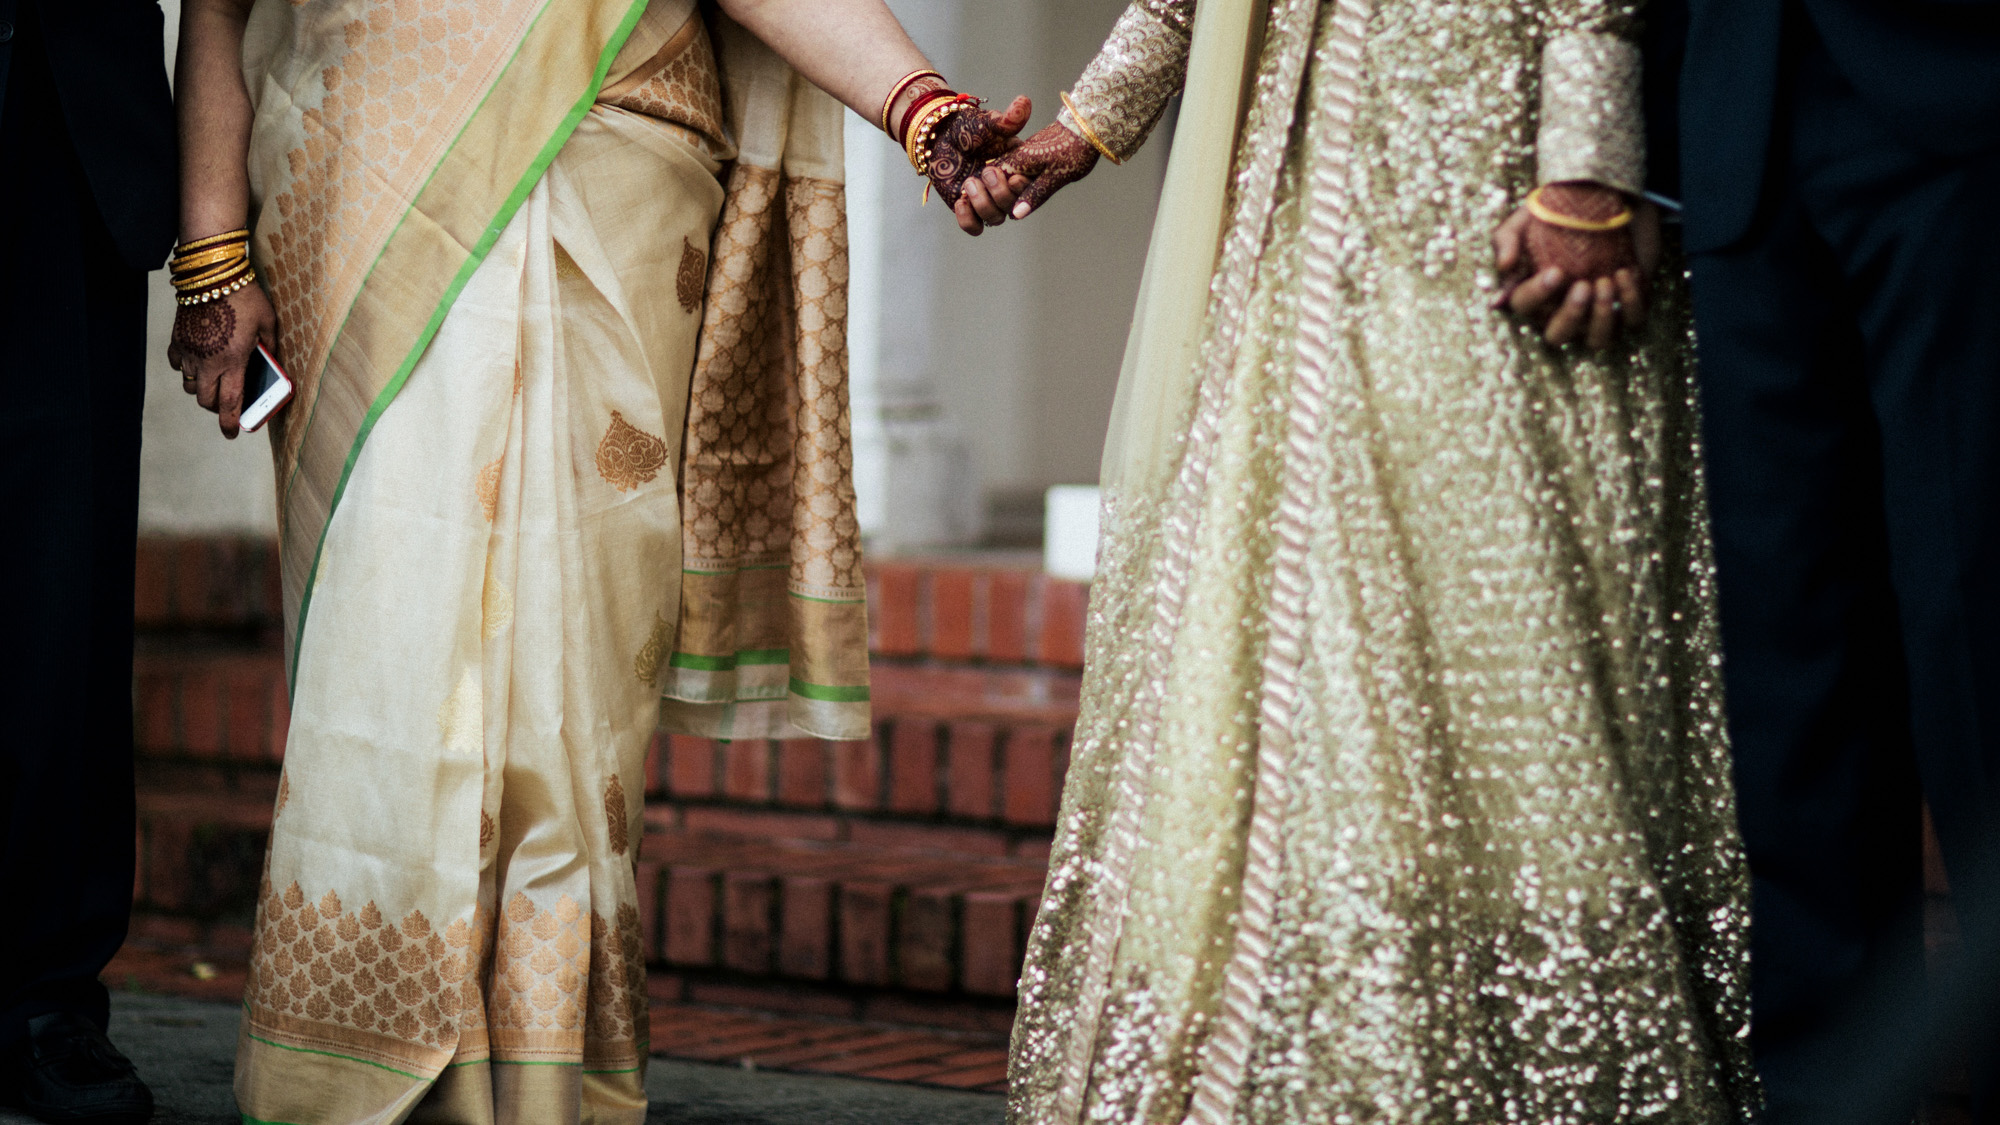 anu_maneesh_alec_vanderboom_Indian_wedding_photography-0156.jpg